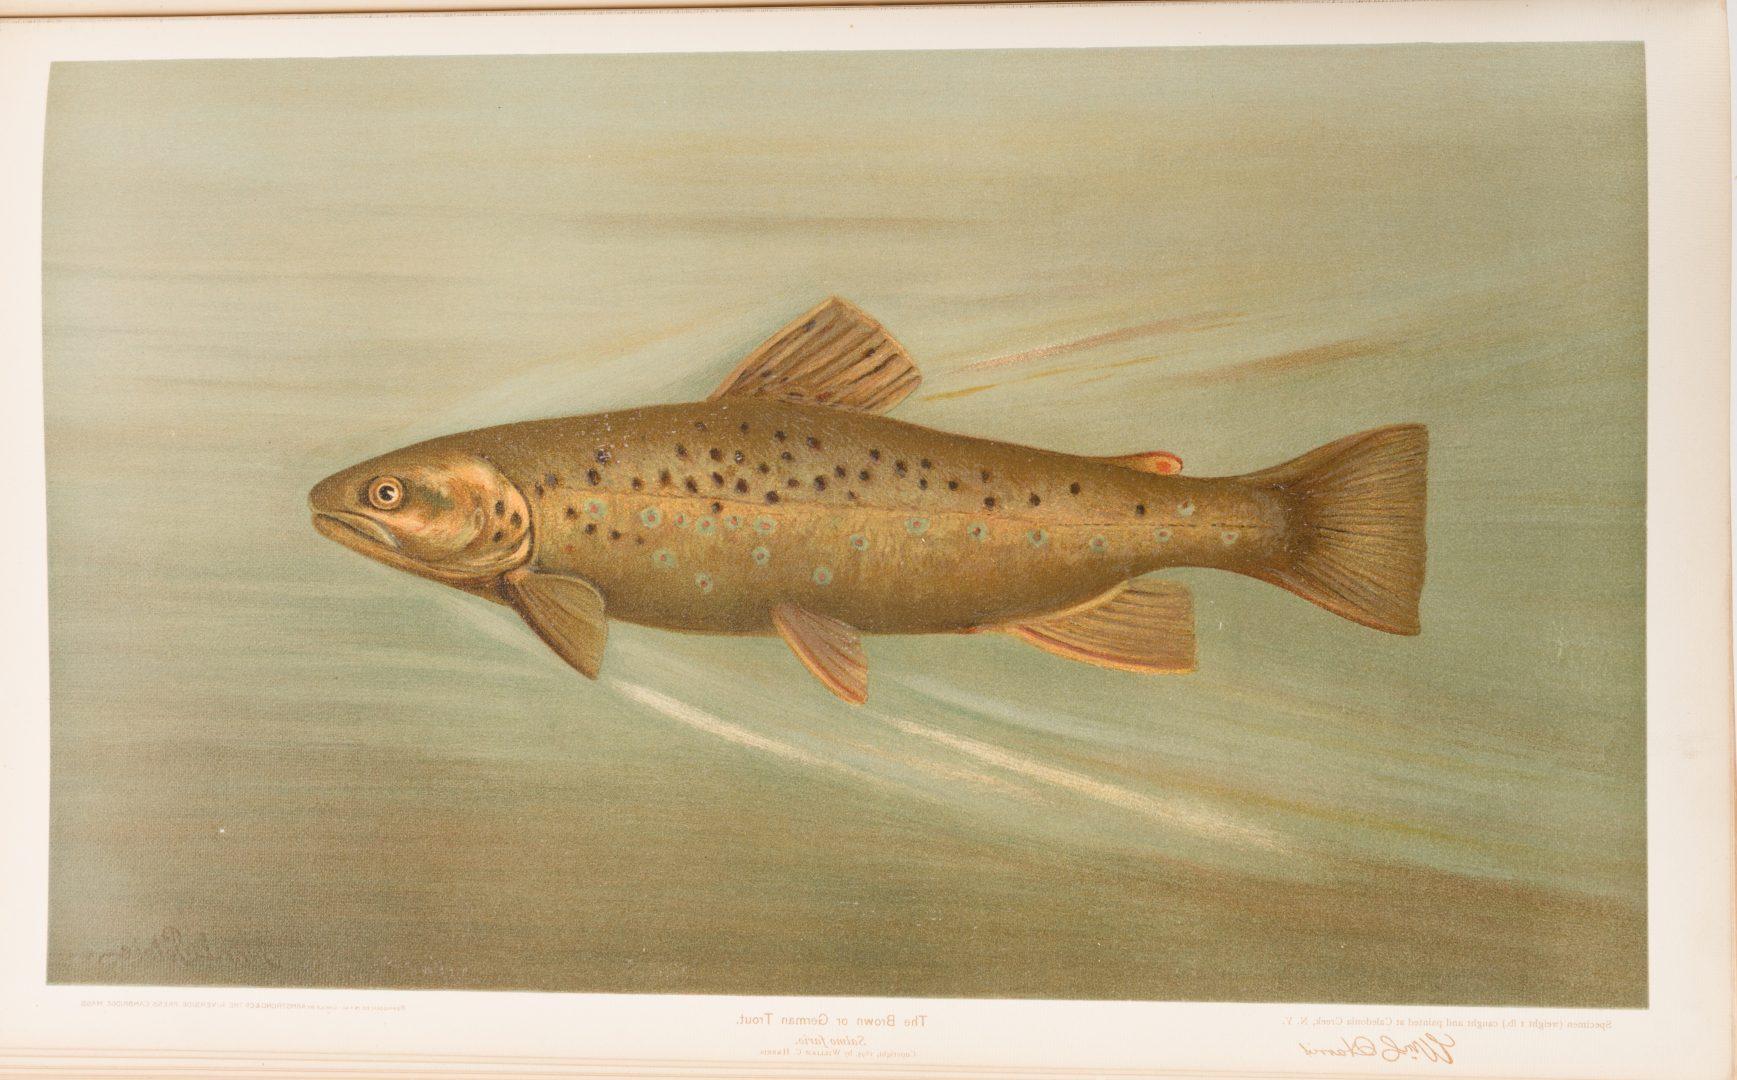 Lot 455: The Fishes of North America, William C. Harris, 1898